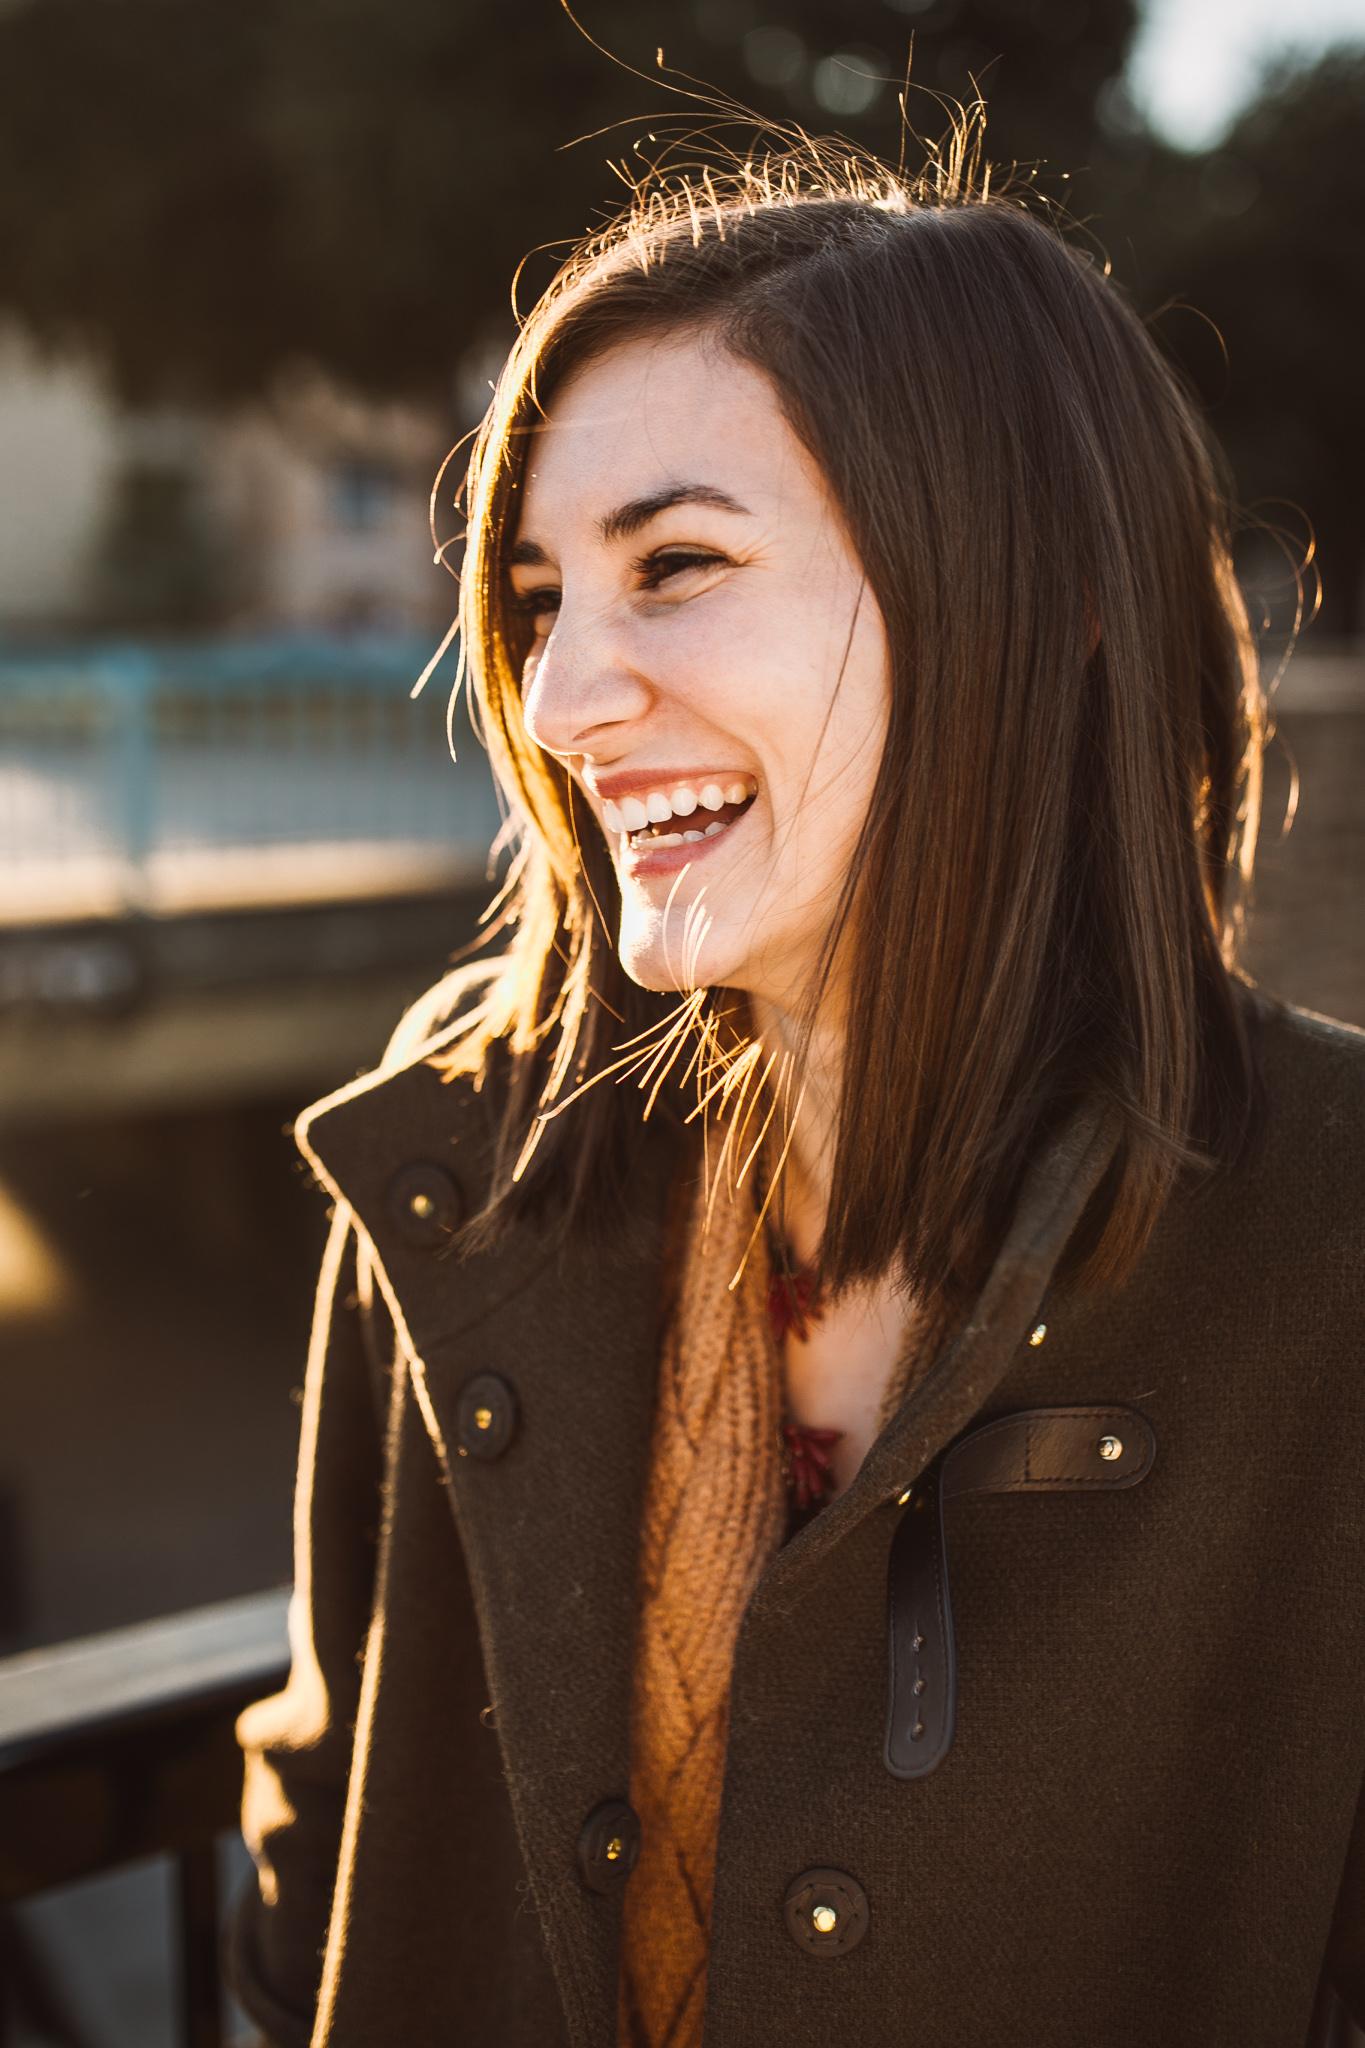 Alexa-Vossler_Dallas-Photographer_Dallas-Headshot-Photographer-3.jpg